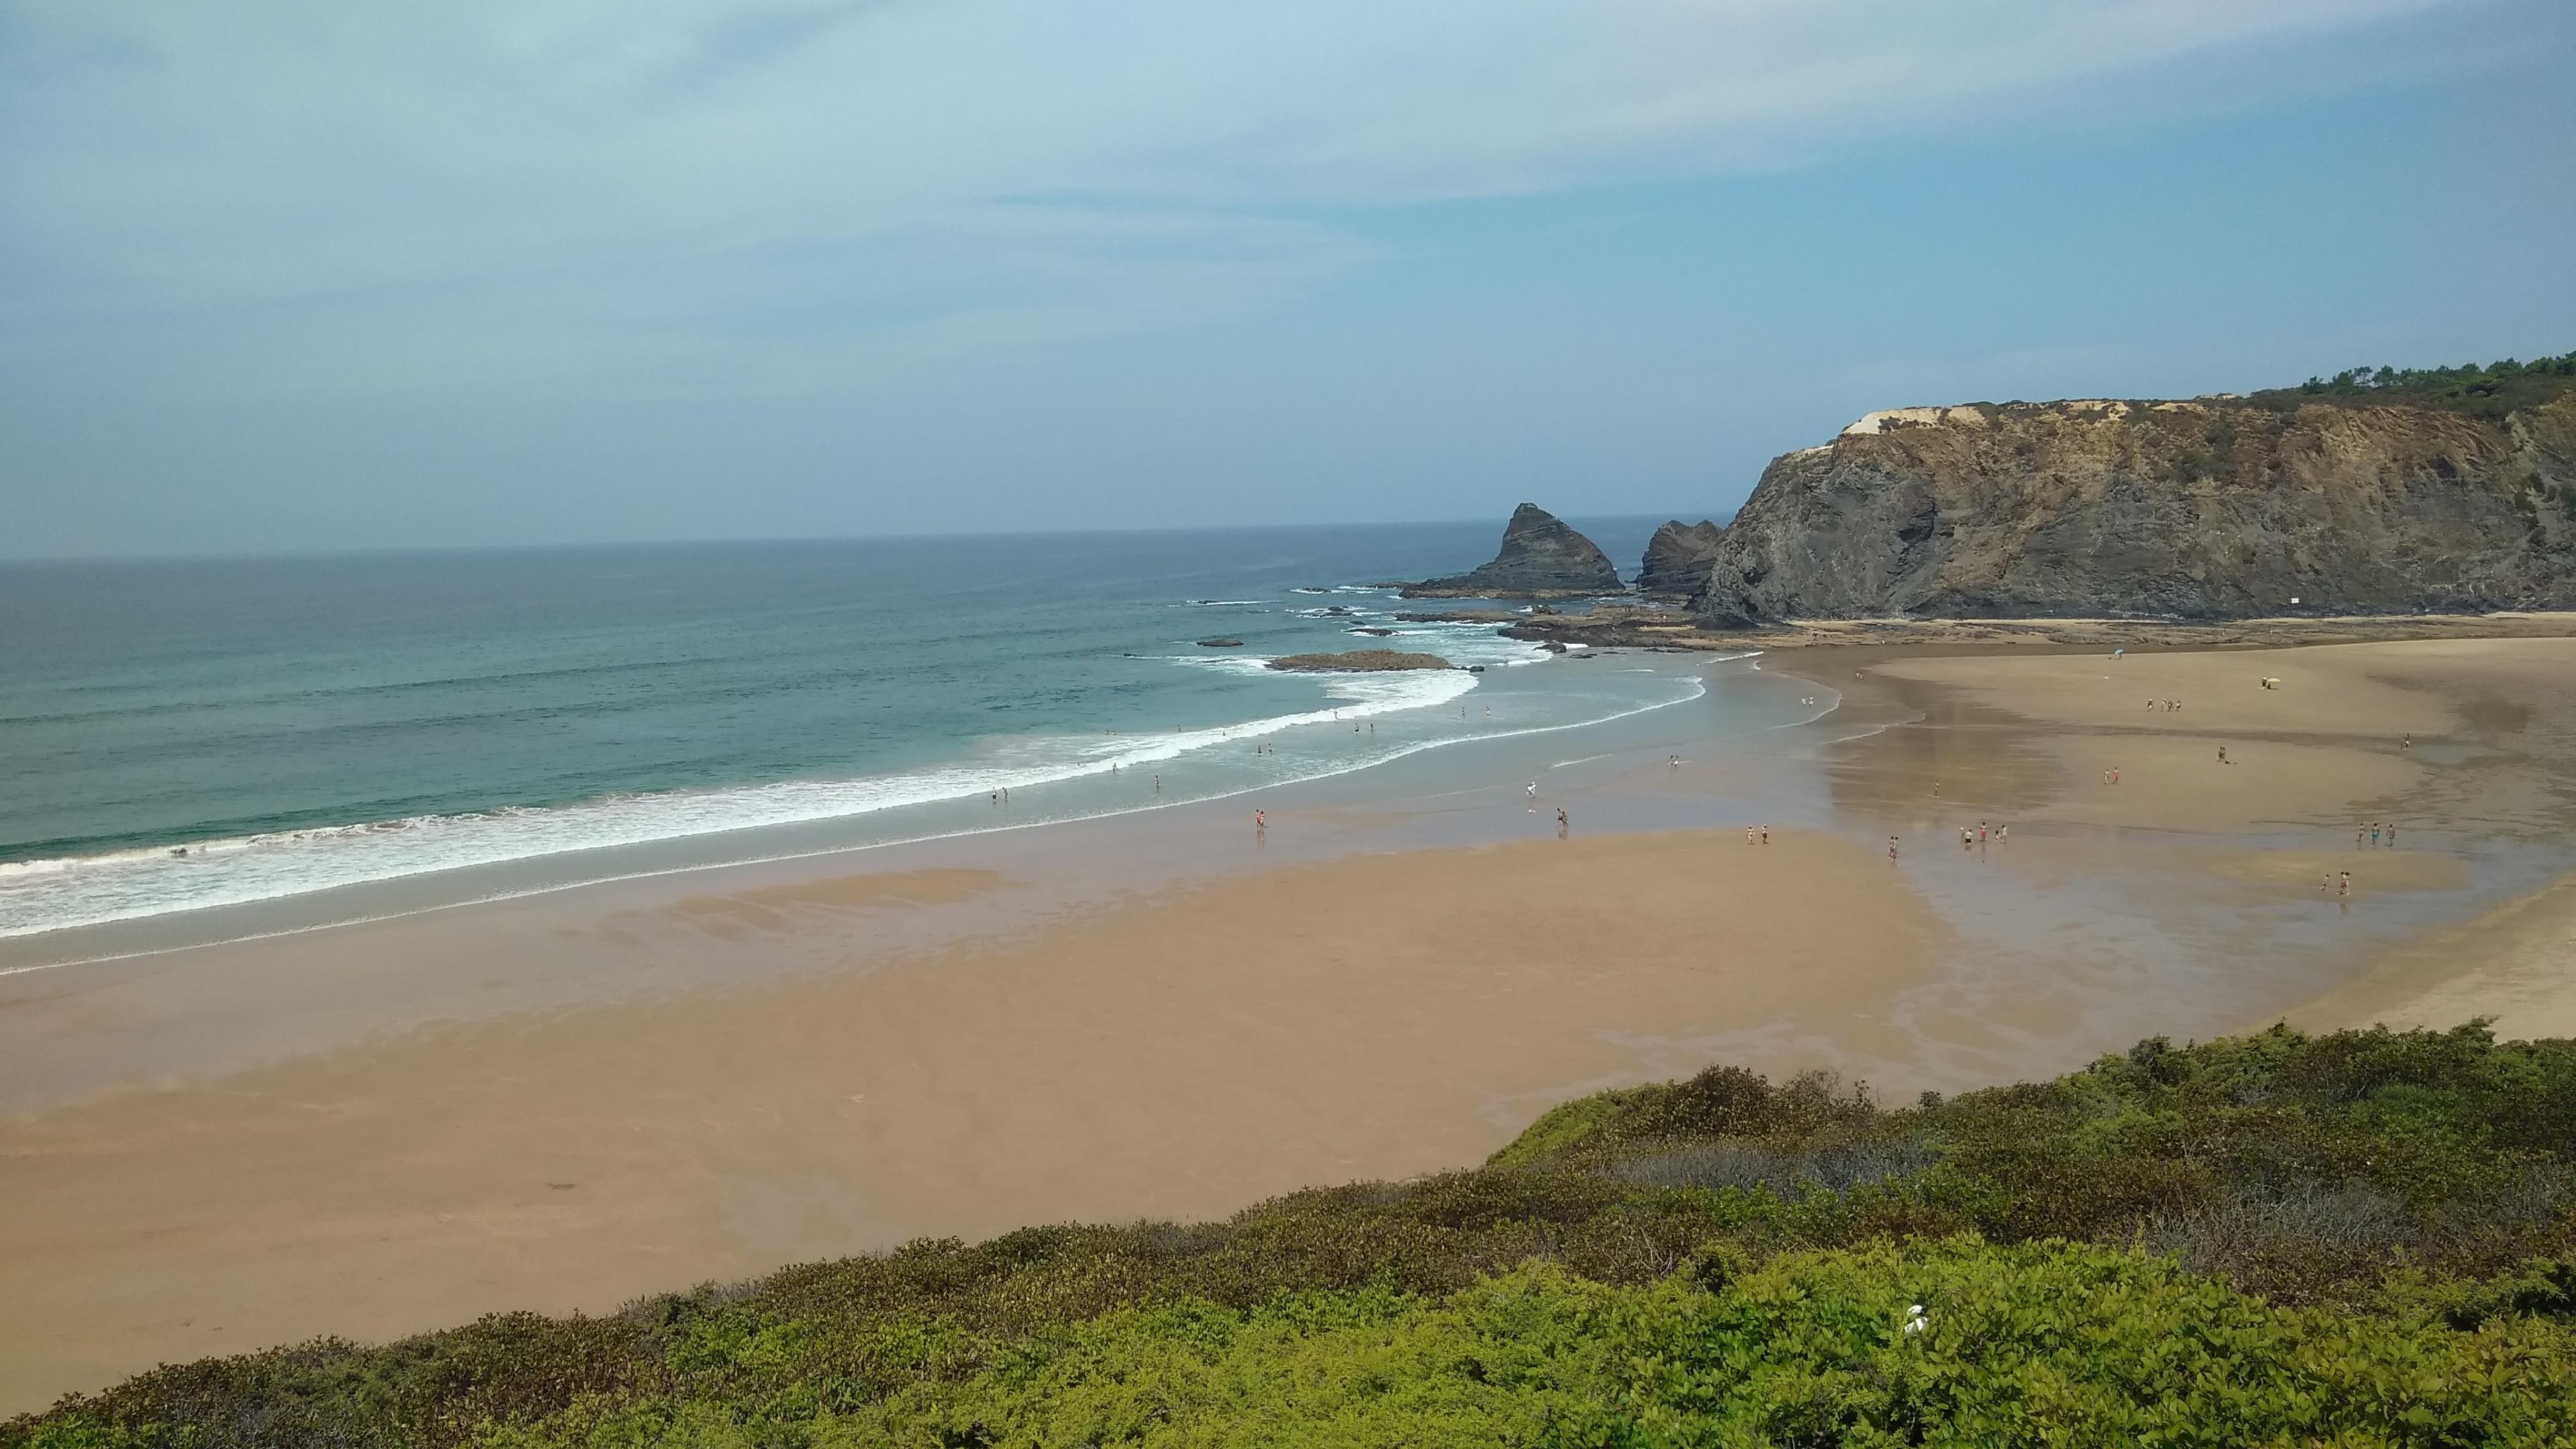 Odeceixe, Aljezur, Faro District, Portugal